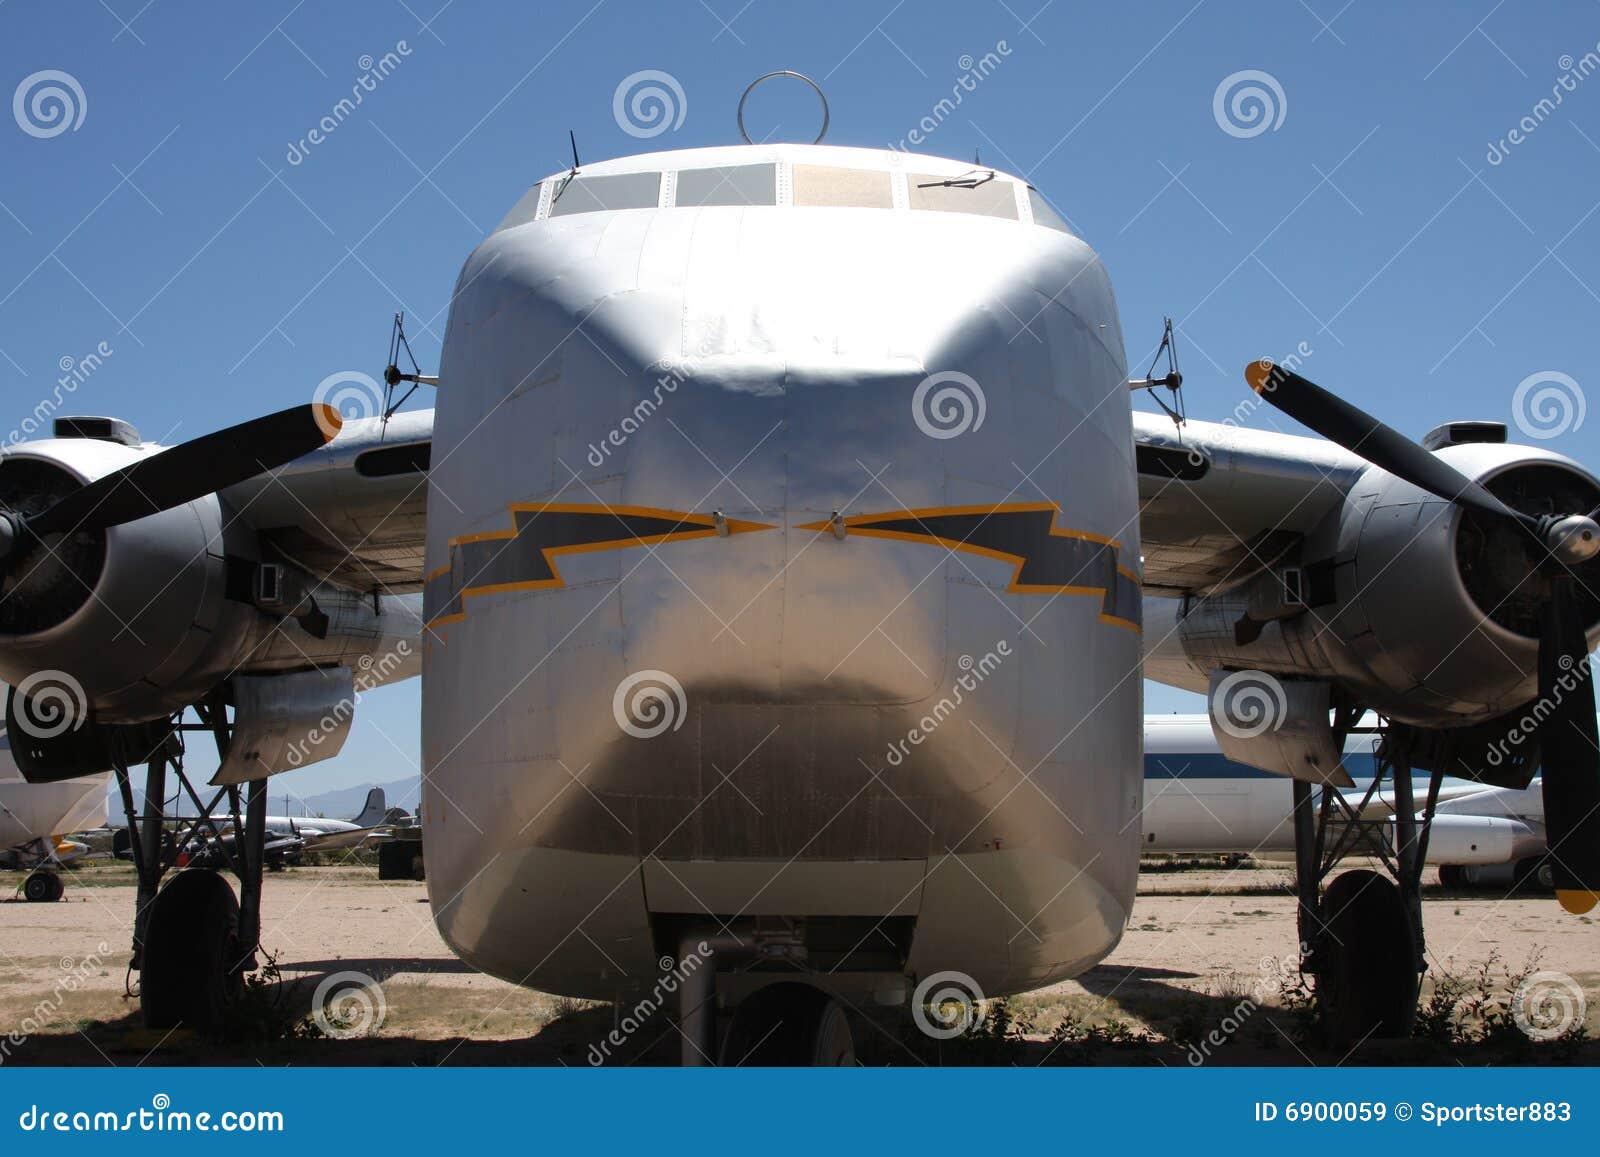 Oude ladingsvliegtuigen